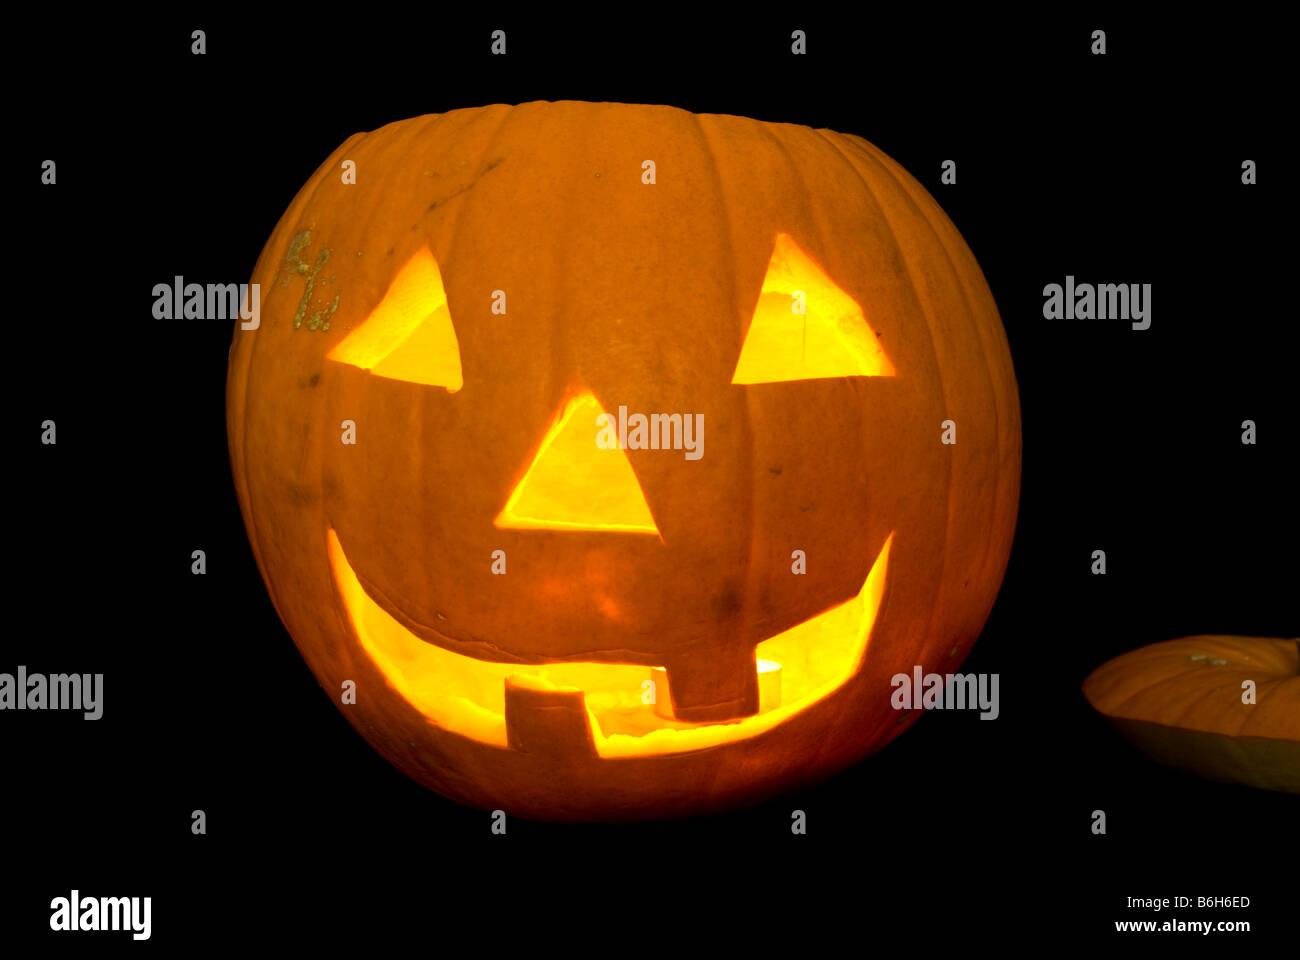 Glowing Candle Lit Halloween Pumpkin Head Carved Jack O